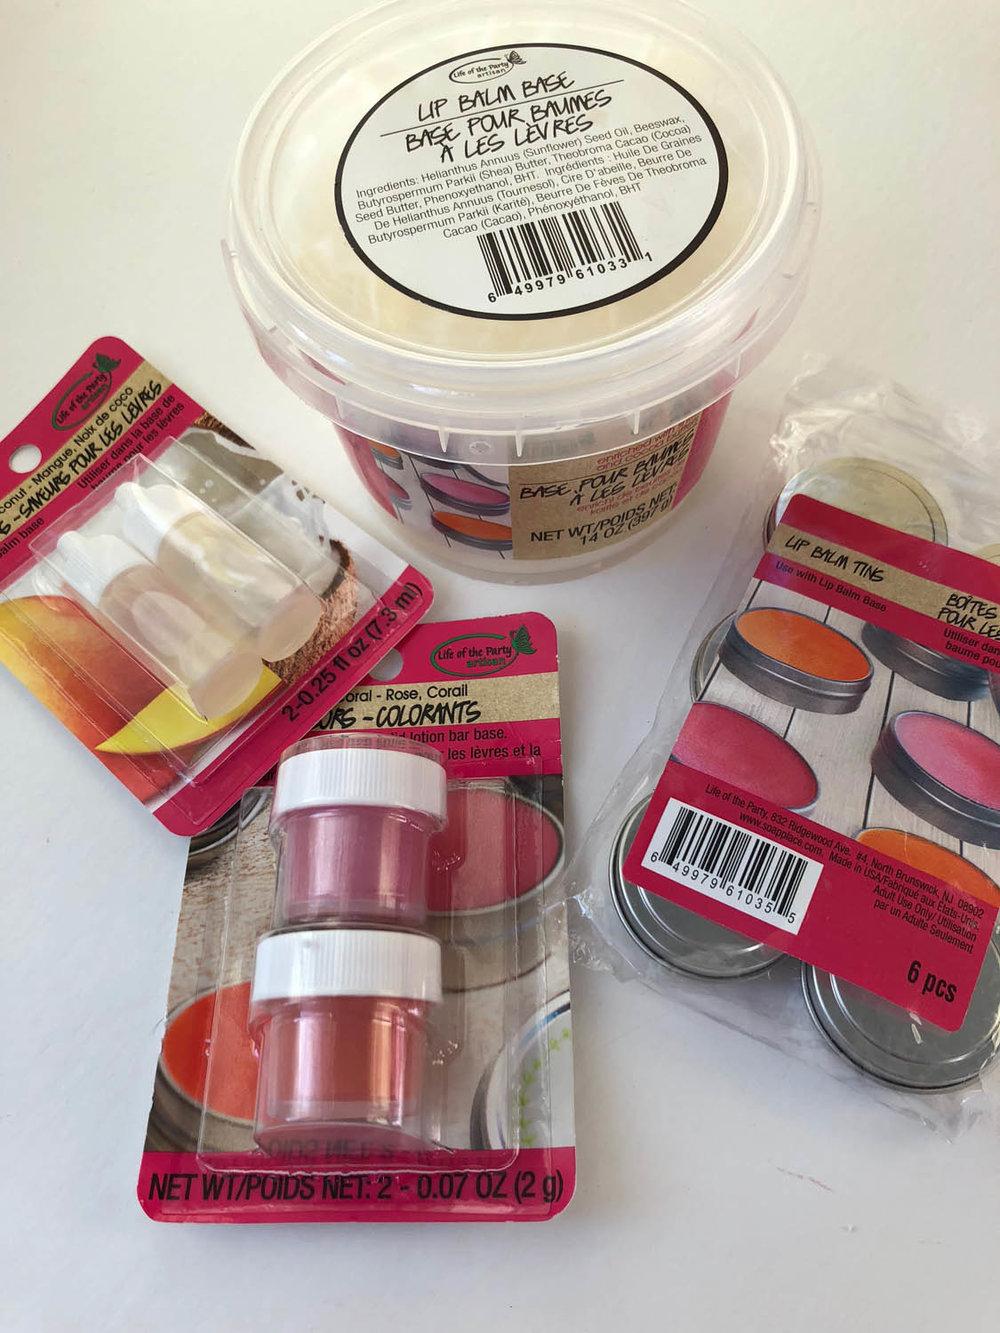 Easy homemade lip balm supplies: metal tins, lip balm base, lip balm colorant, lip balm fragrance/flavoring.